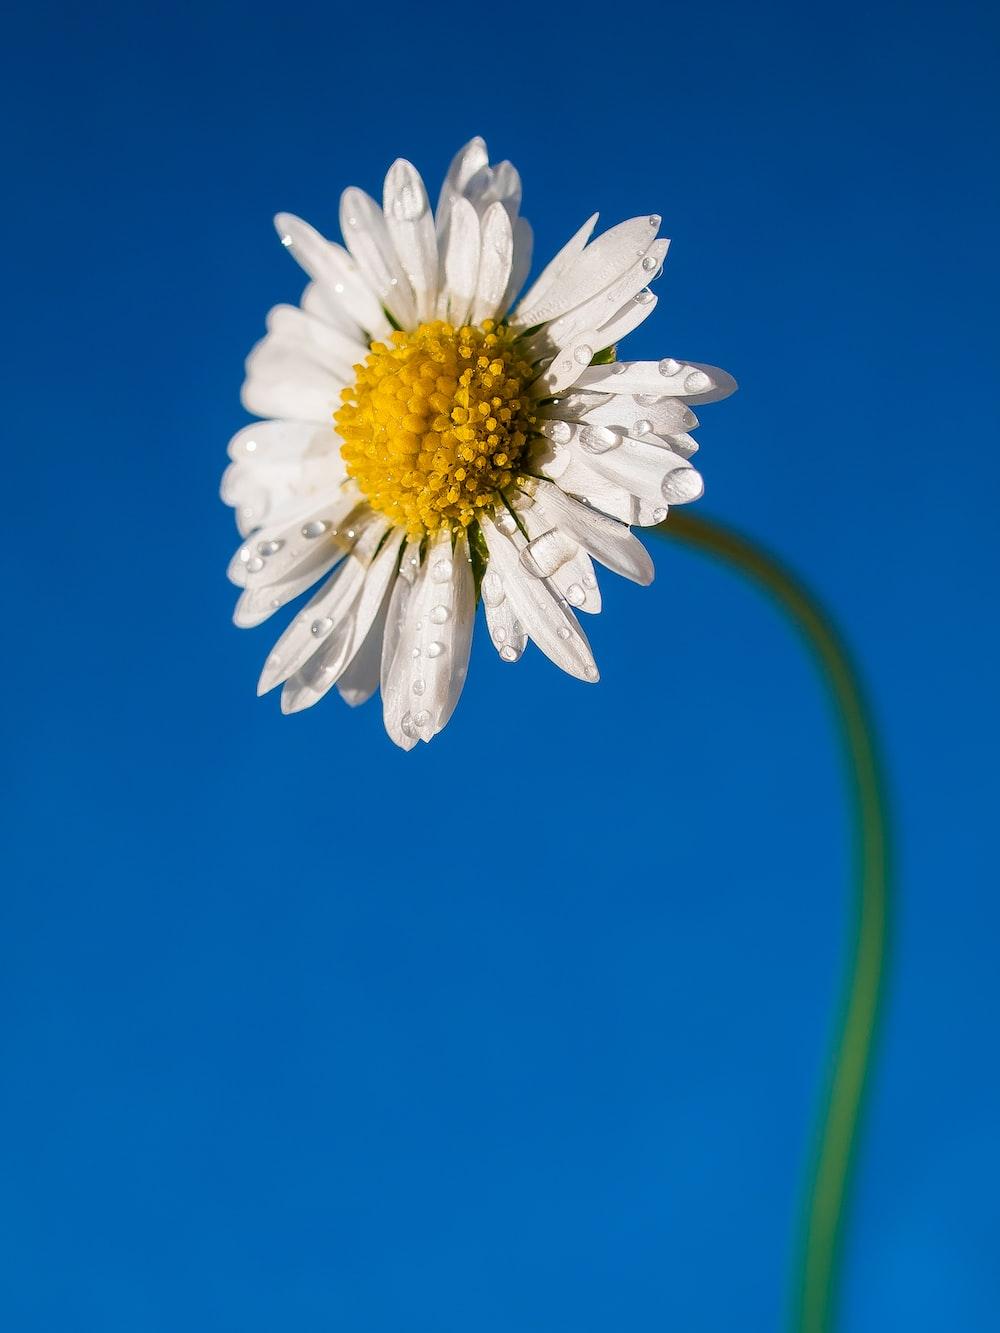 close-up photo of white petaled flower